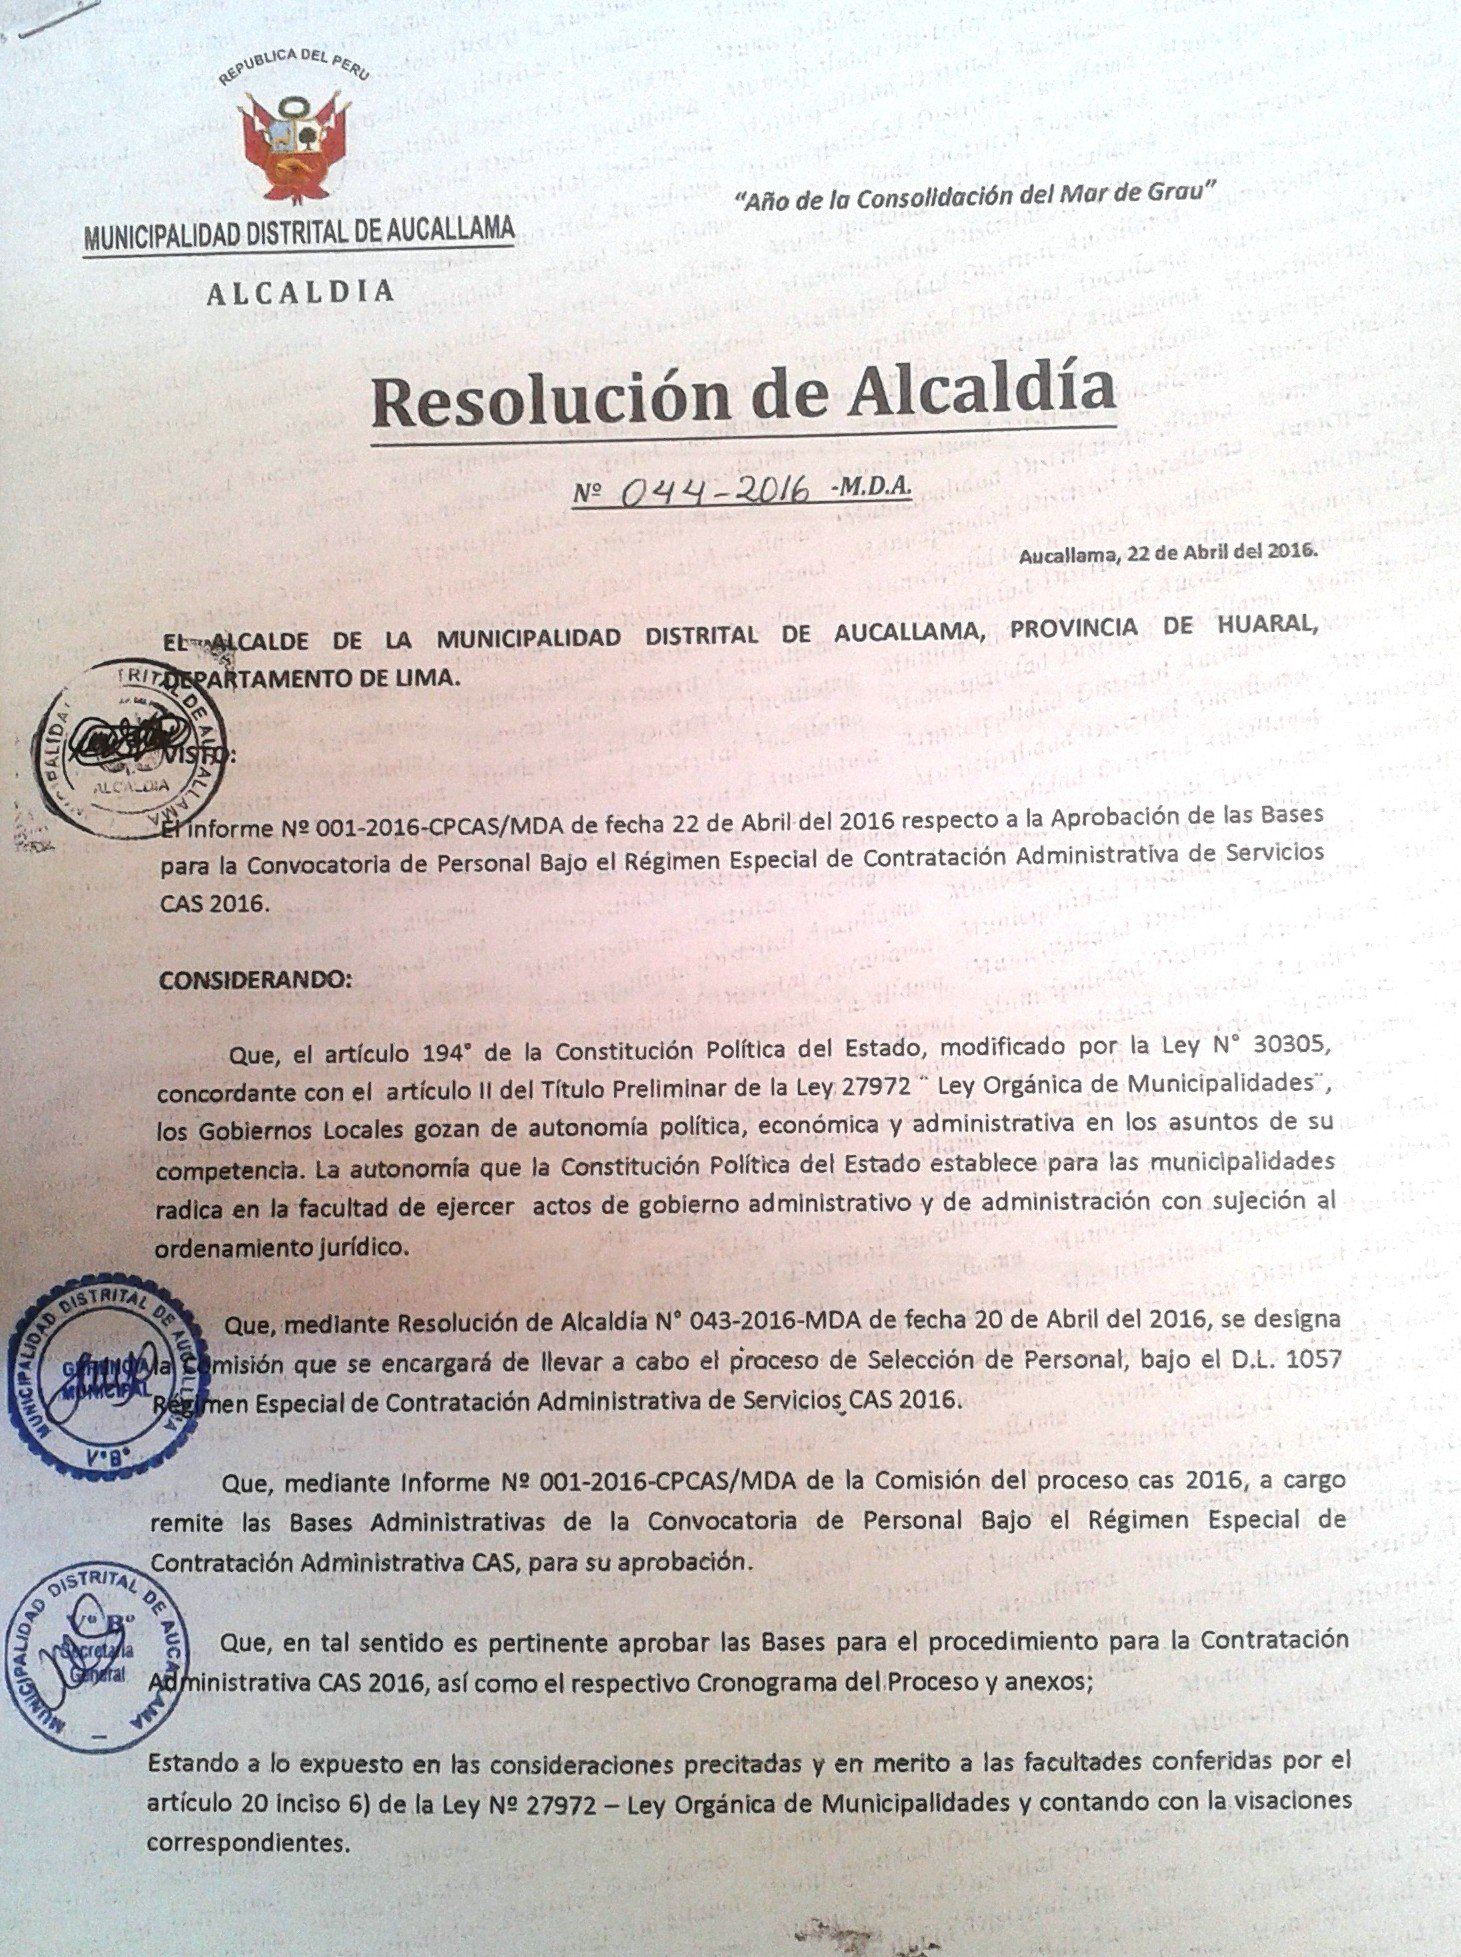 Municipalidad de Aucallama realiza convocatoria para contrato CAS 2016